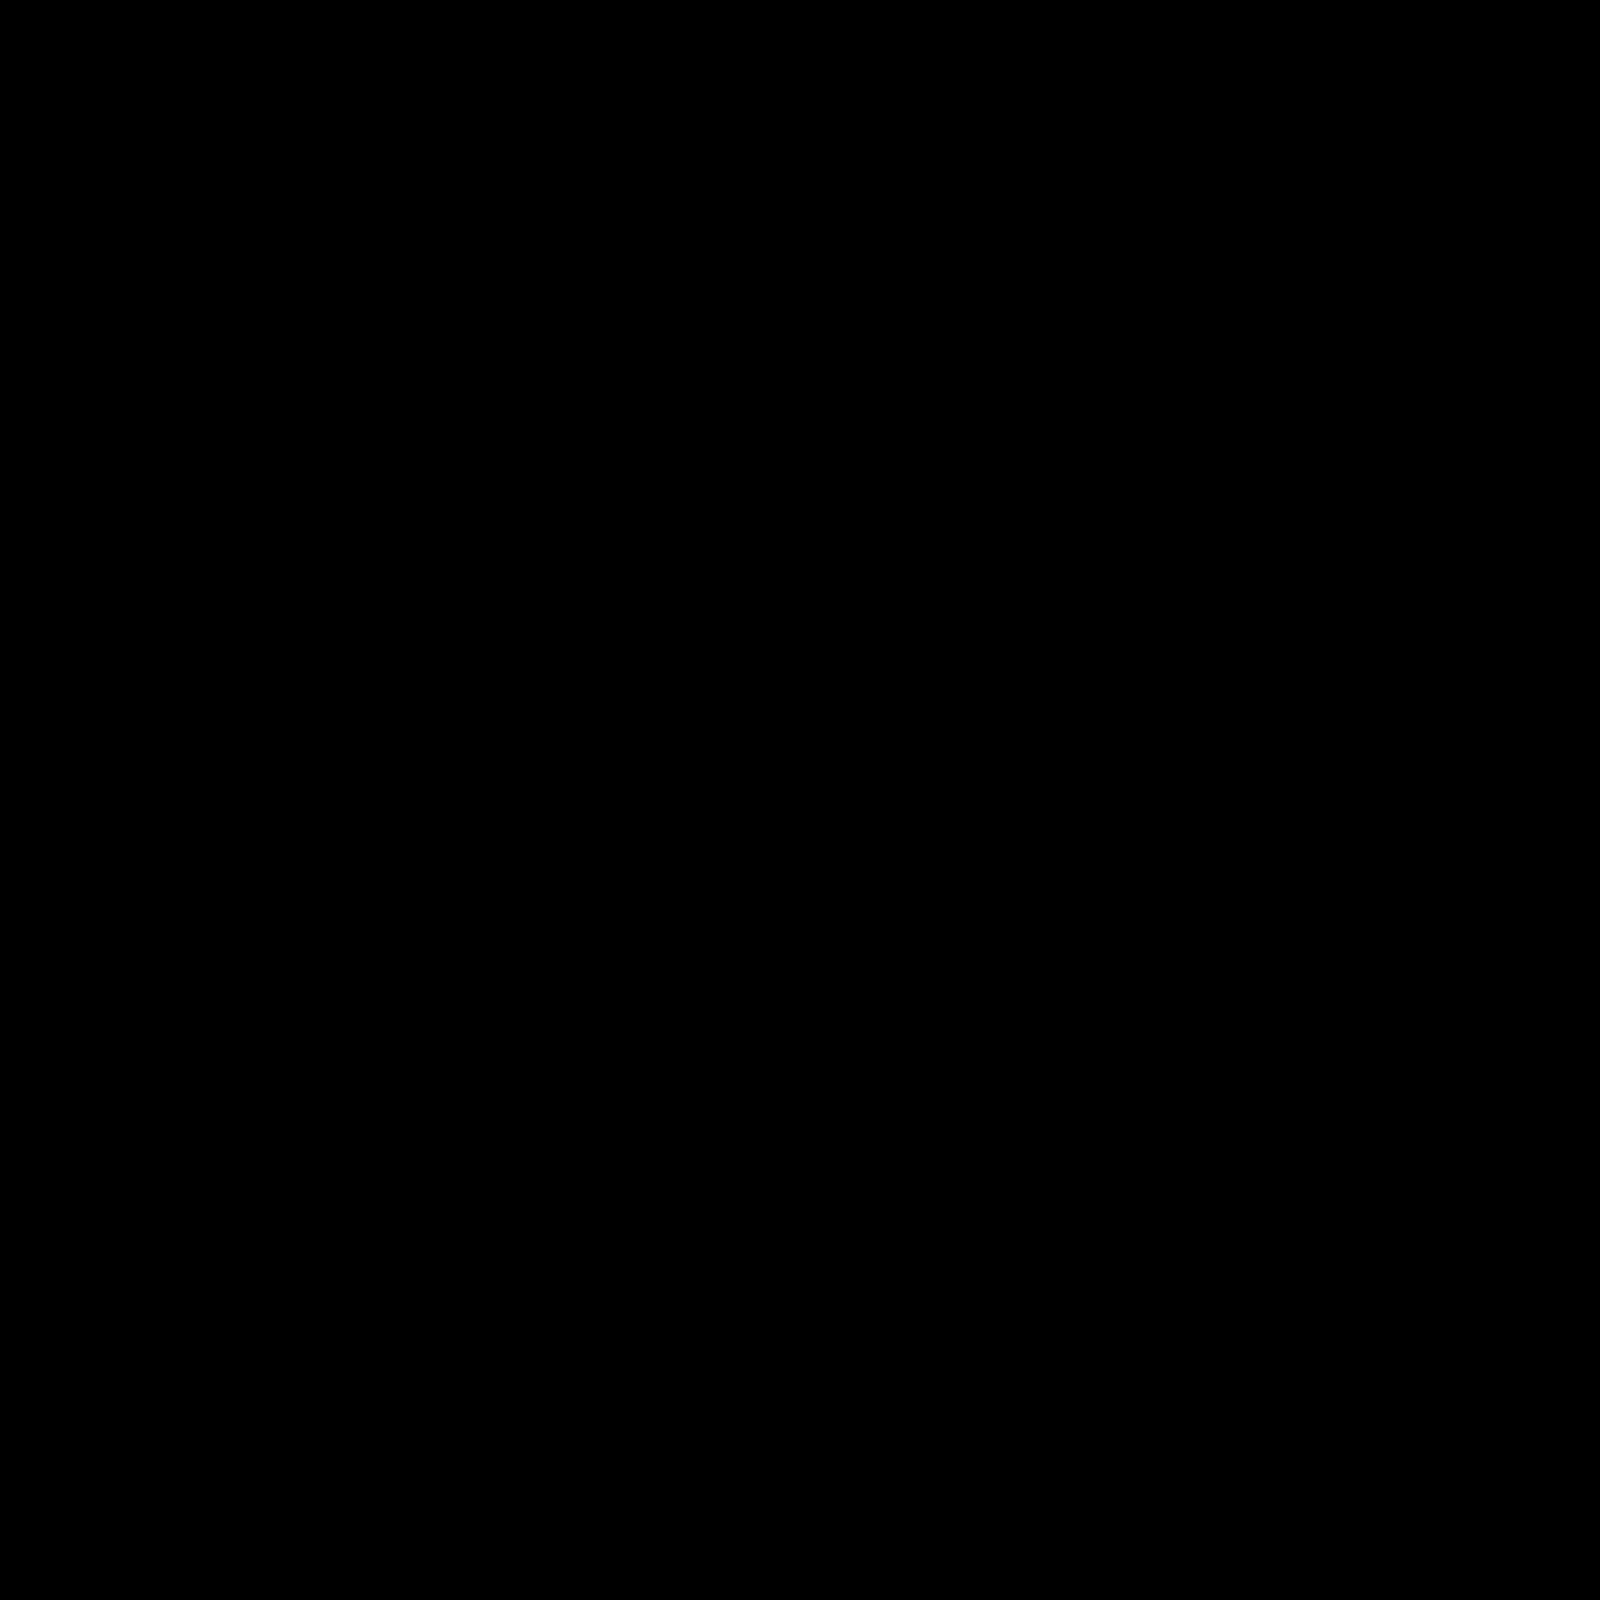 kisspng-computer-icons-ethics-symbol-clip-art-morality-5aded913b0f605-6446678115245540037248